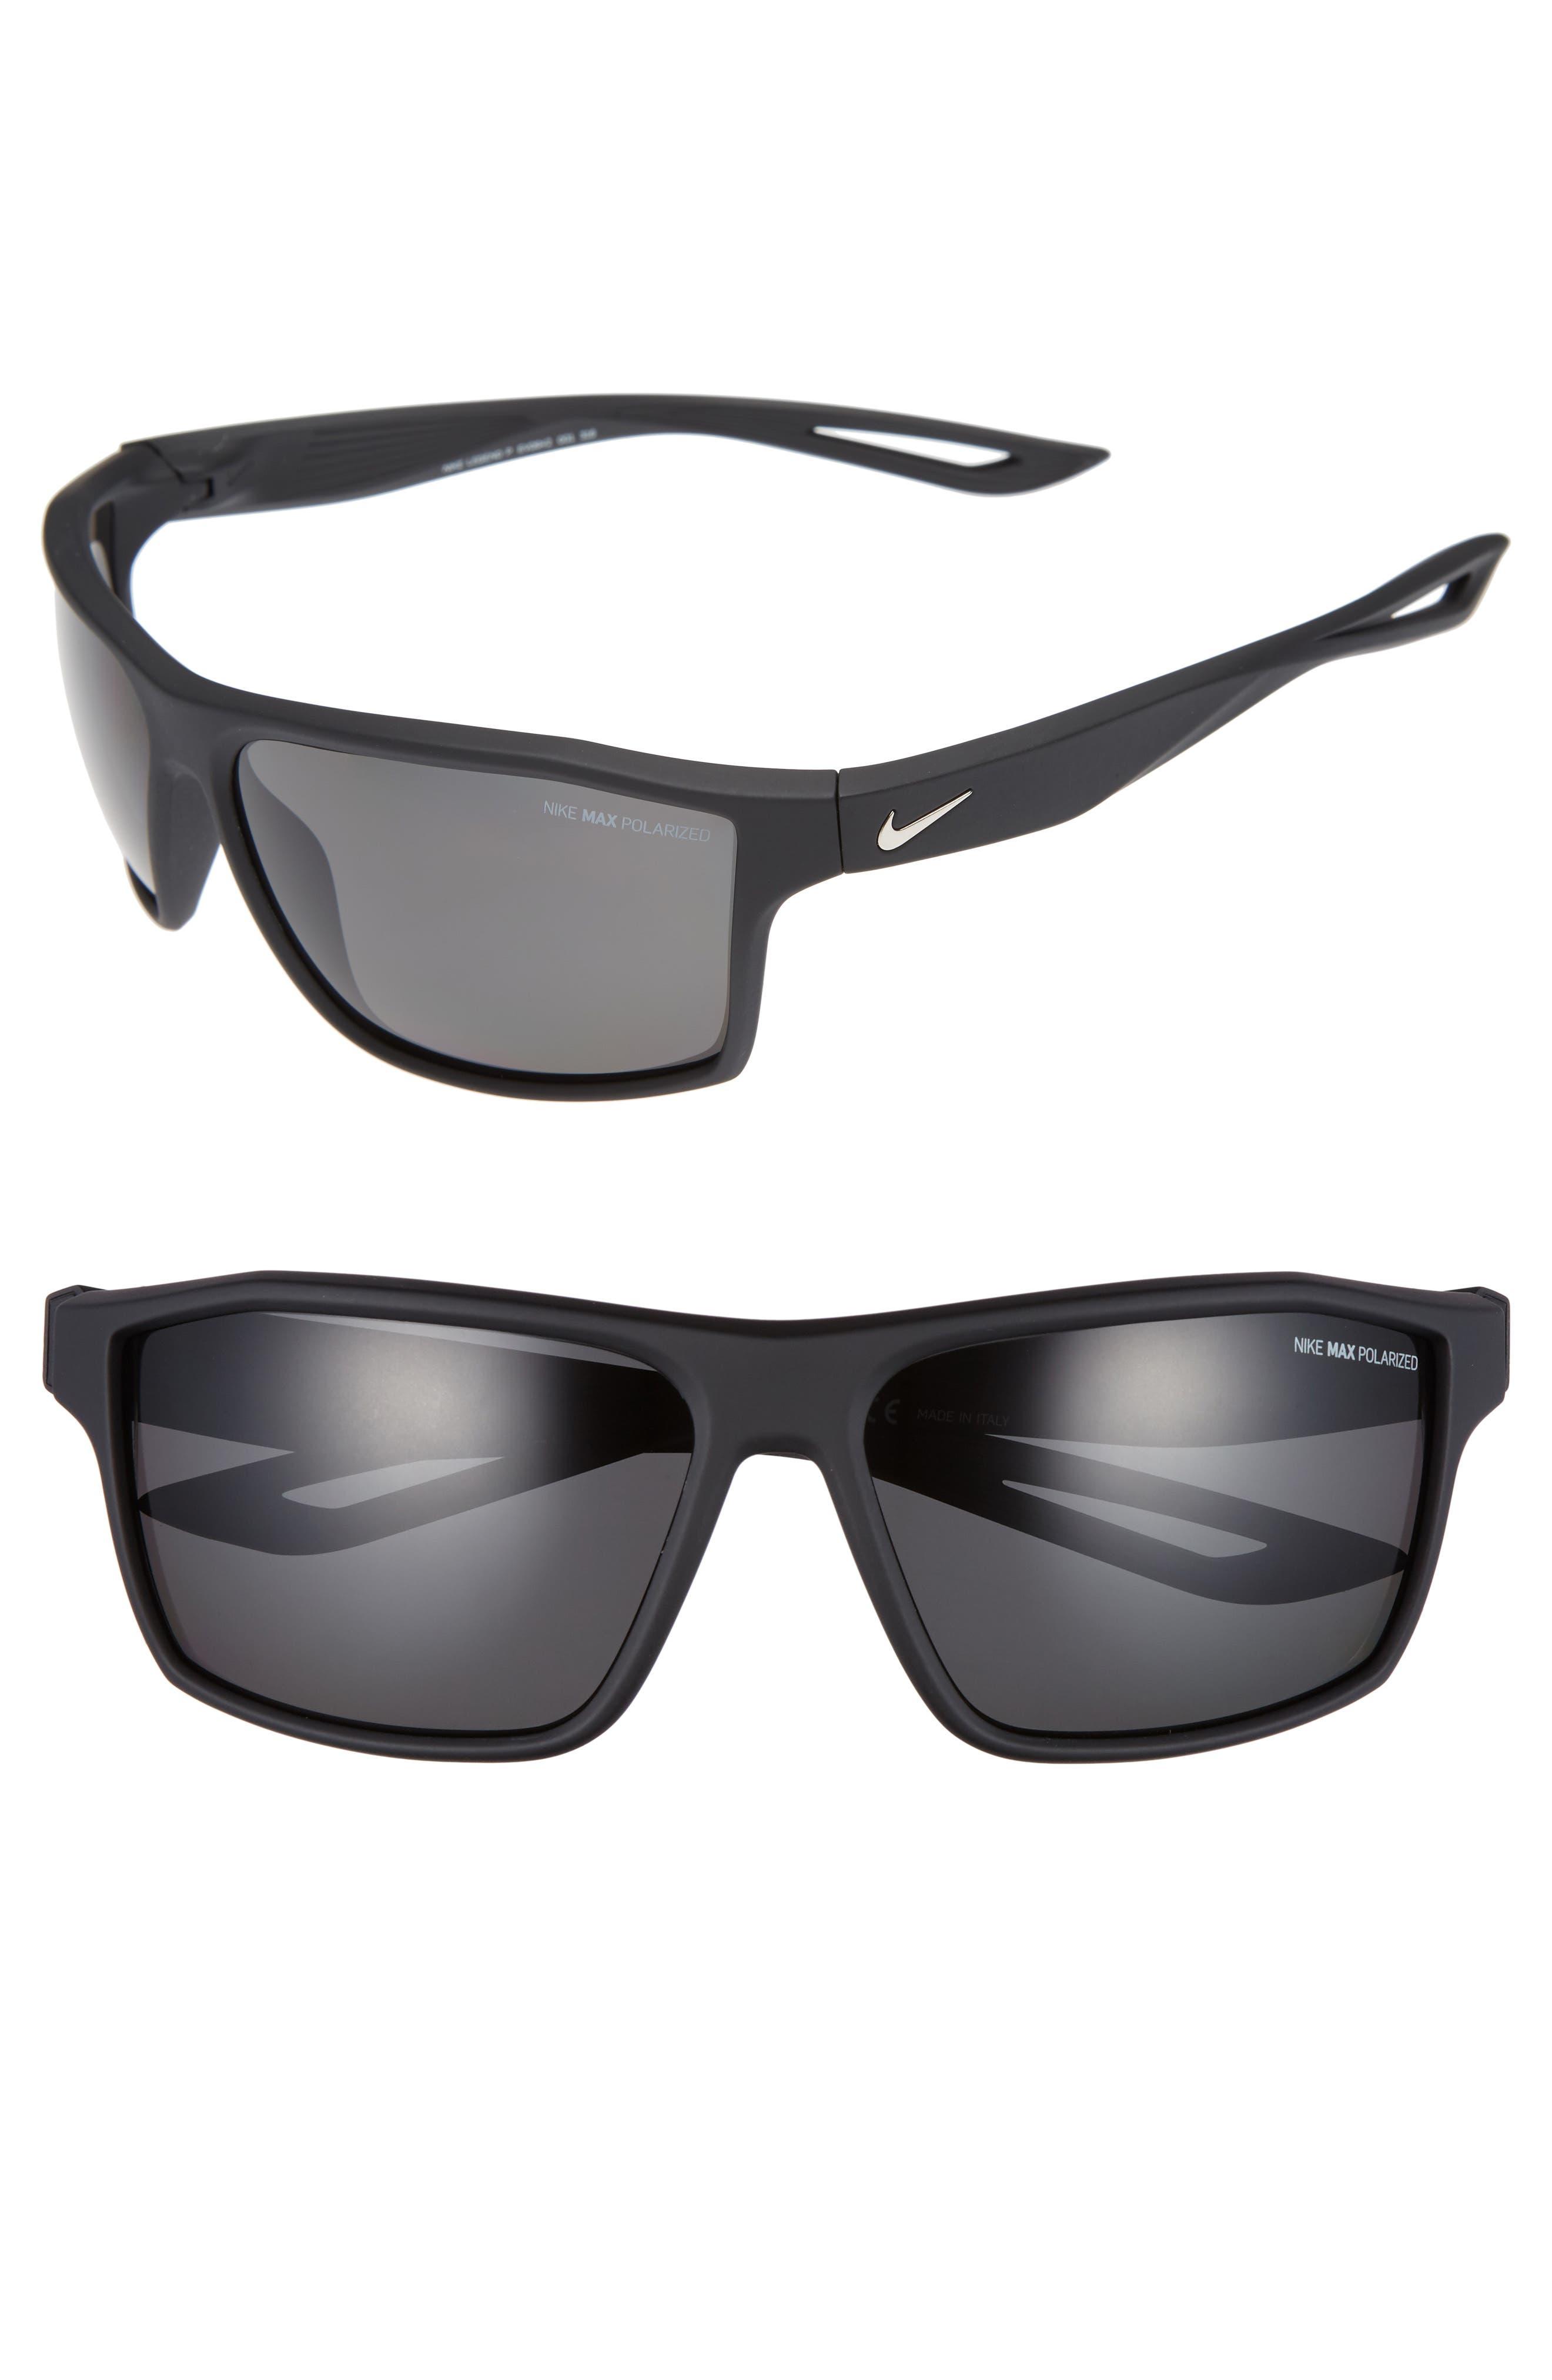 Legend 65mm Polarized Multi-Sport Sunglasses,                             Main thumbnail 1, color,                             MATTE BLACK/ SILVER